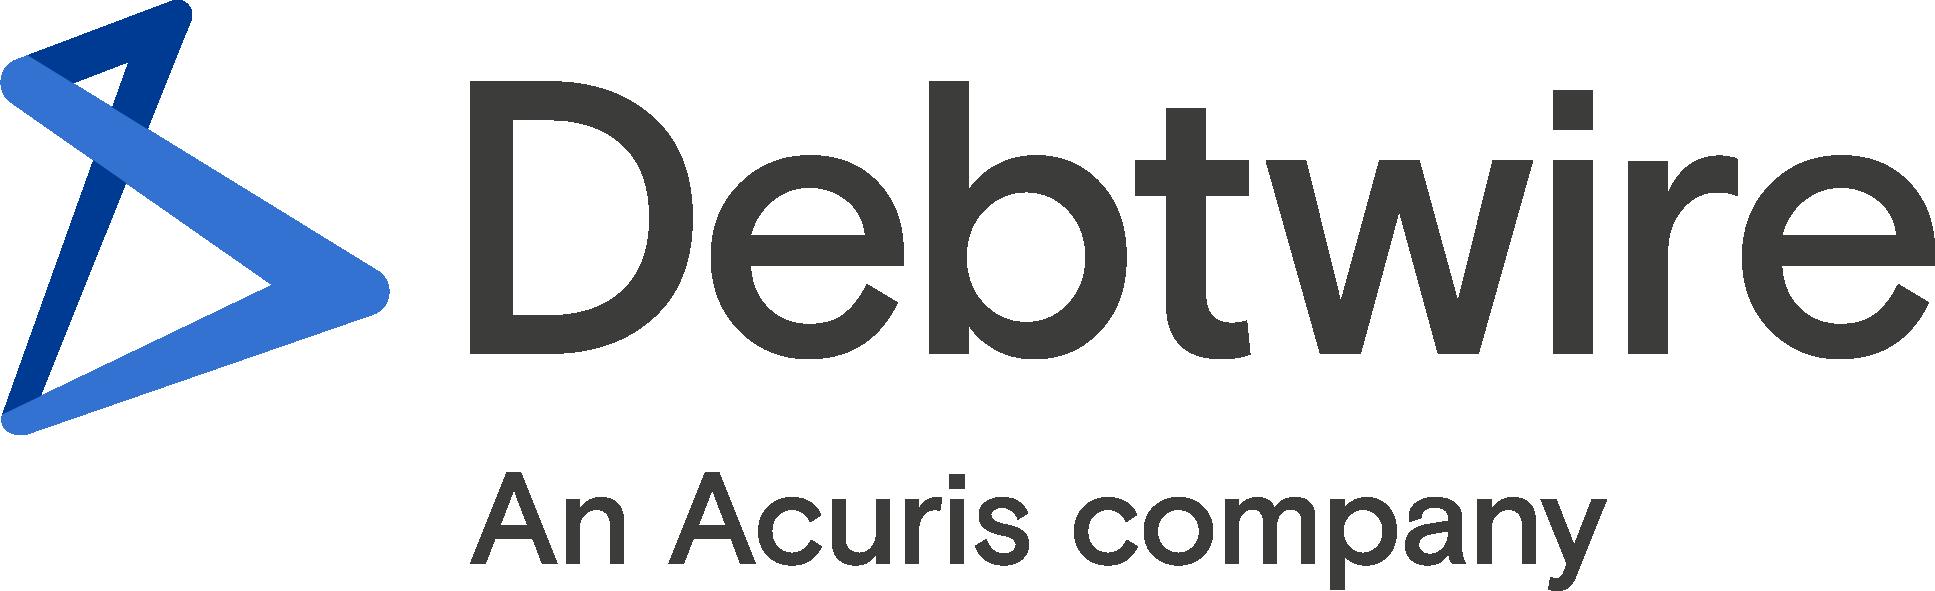 Debtwire_Logo_RGB